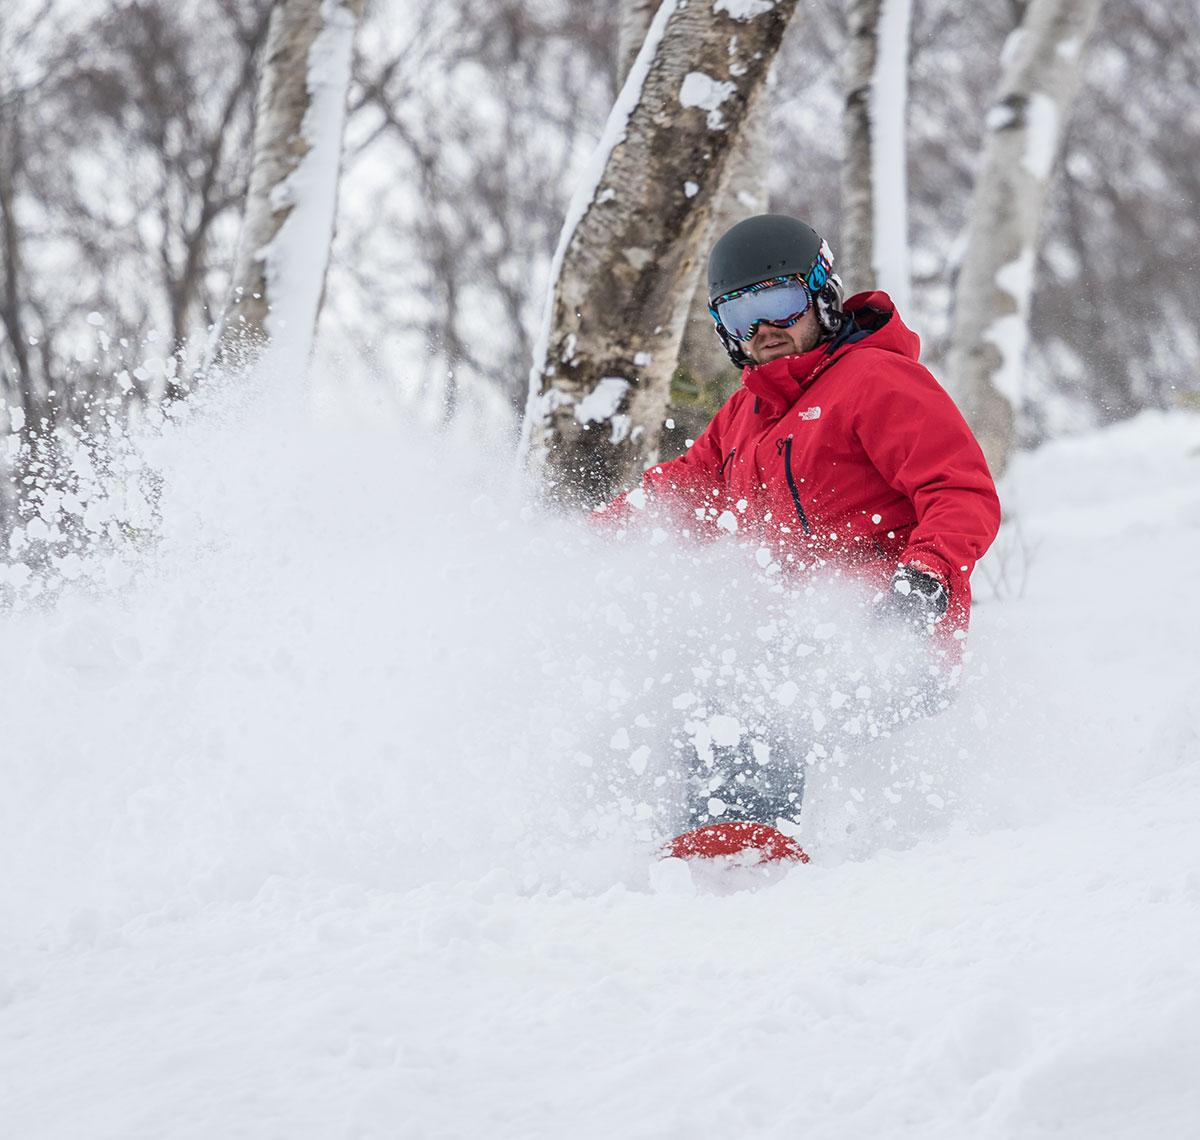 2-SB-PC-Prices-1200w-x-1140h400w Adult (15+) Snowboard Powder Sessions